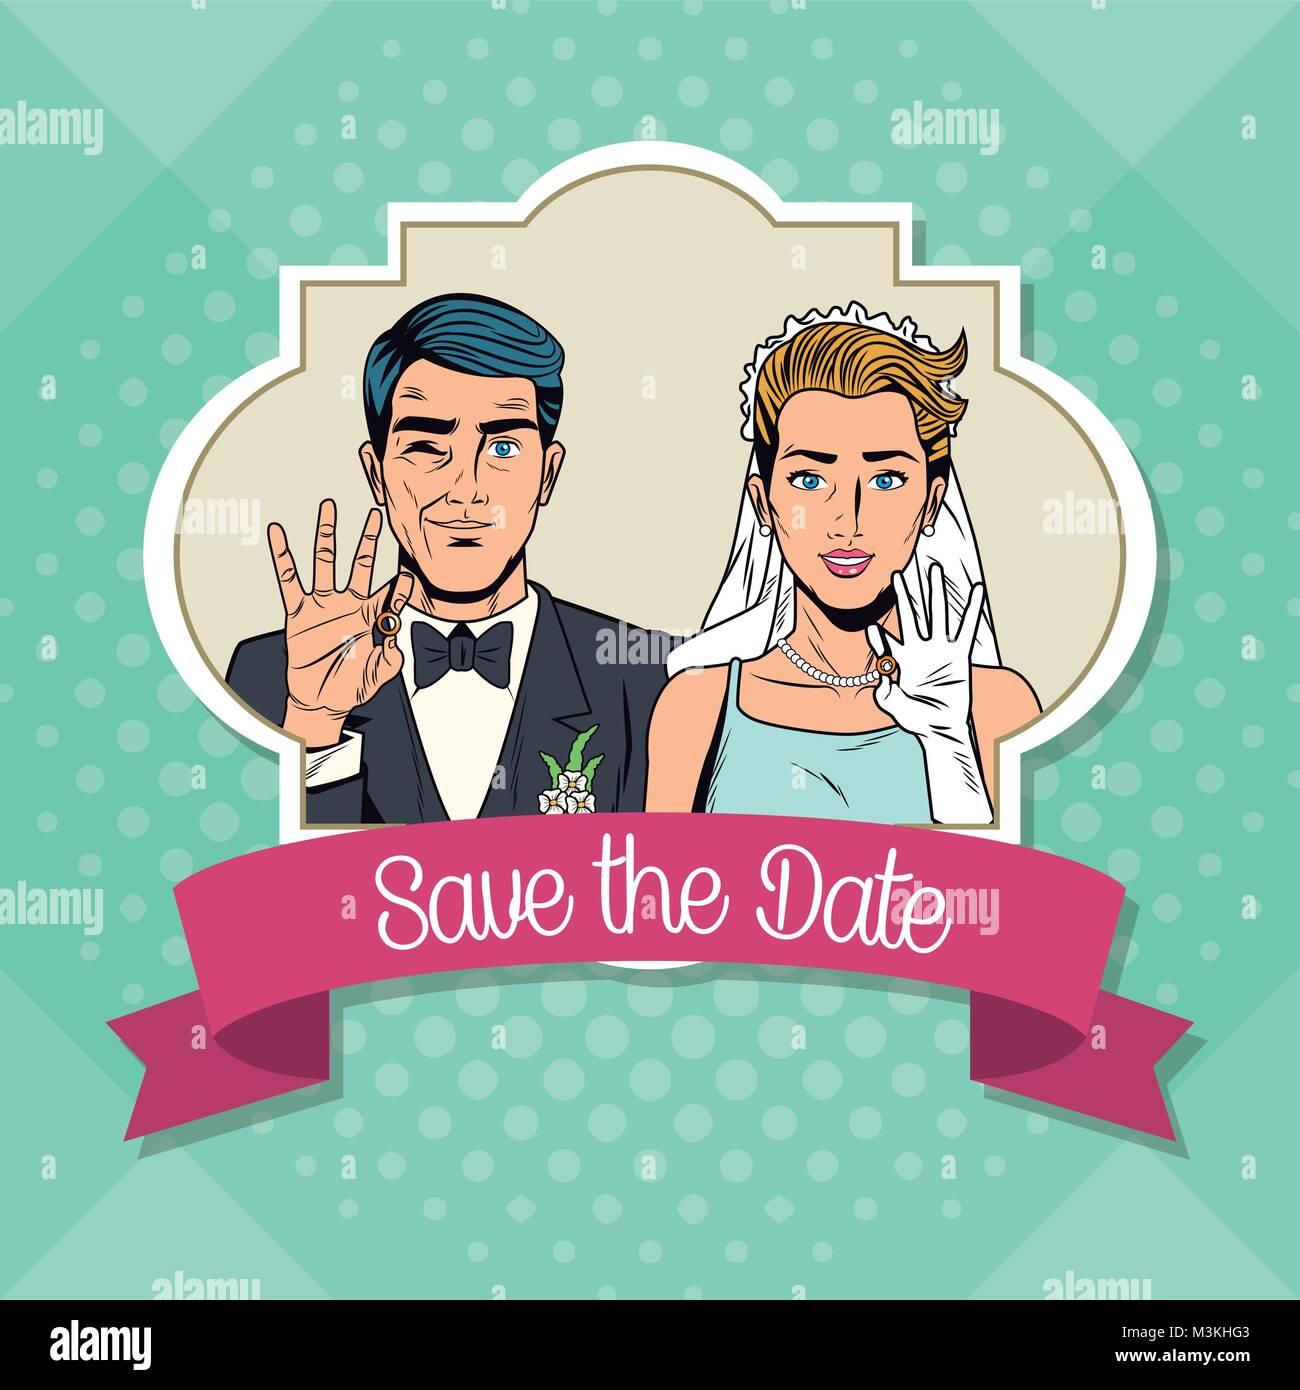 save the date pop art cartoon internet security baniking online